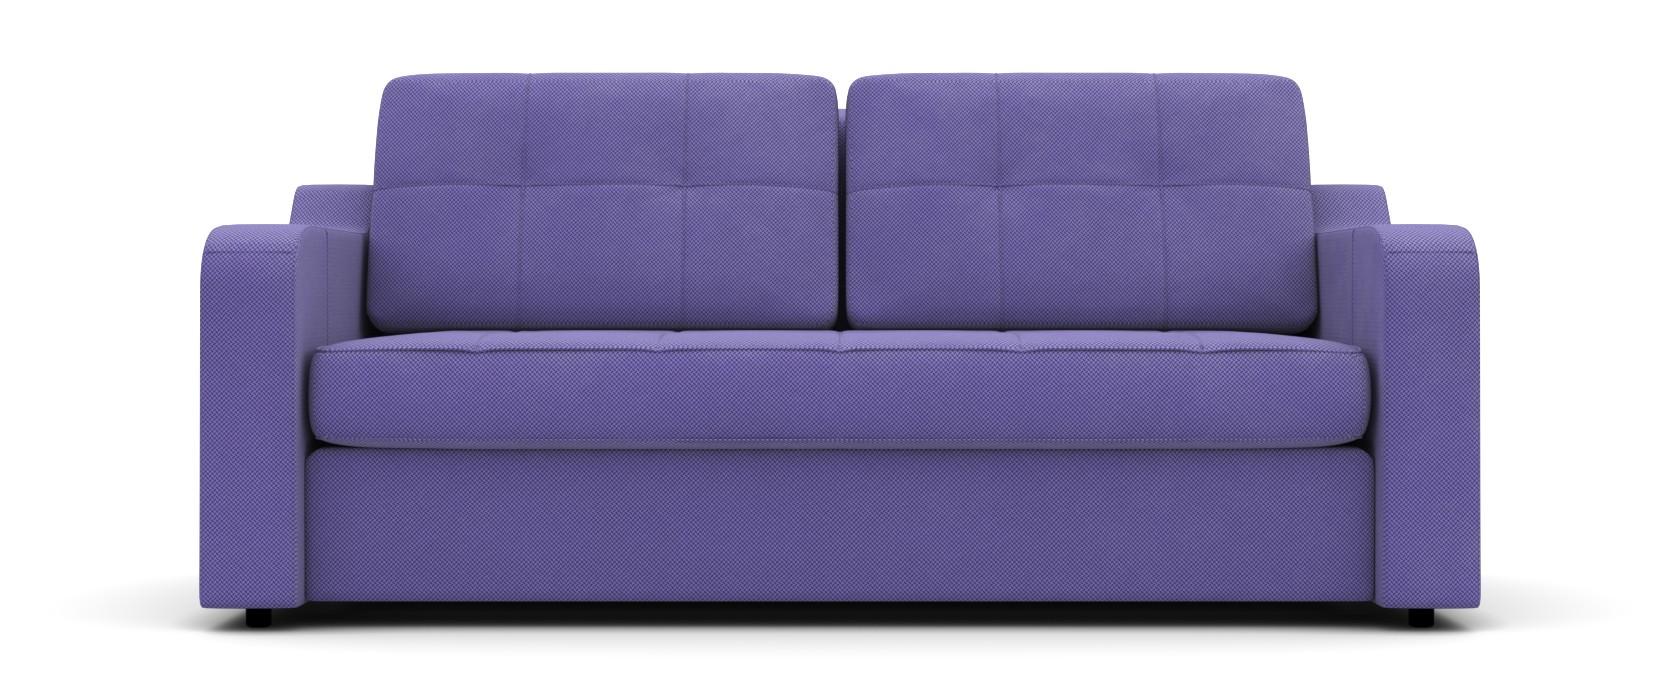 Трехместный диван Vito - Pufetto